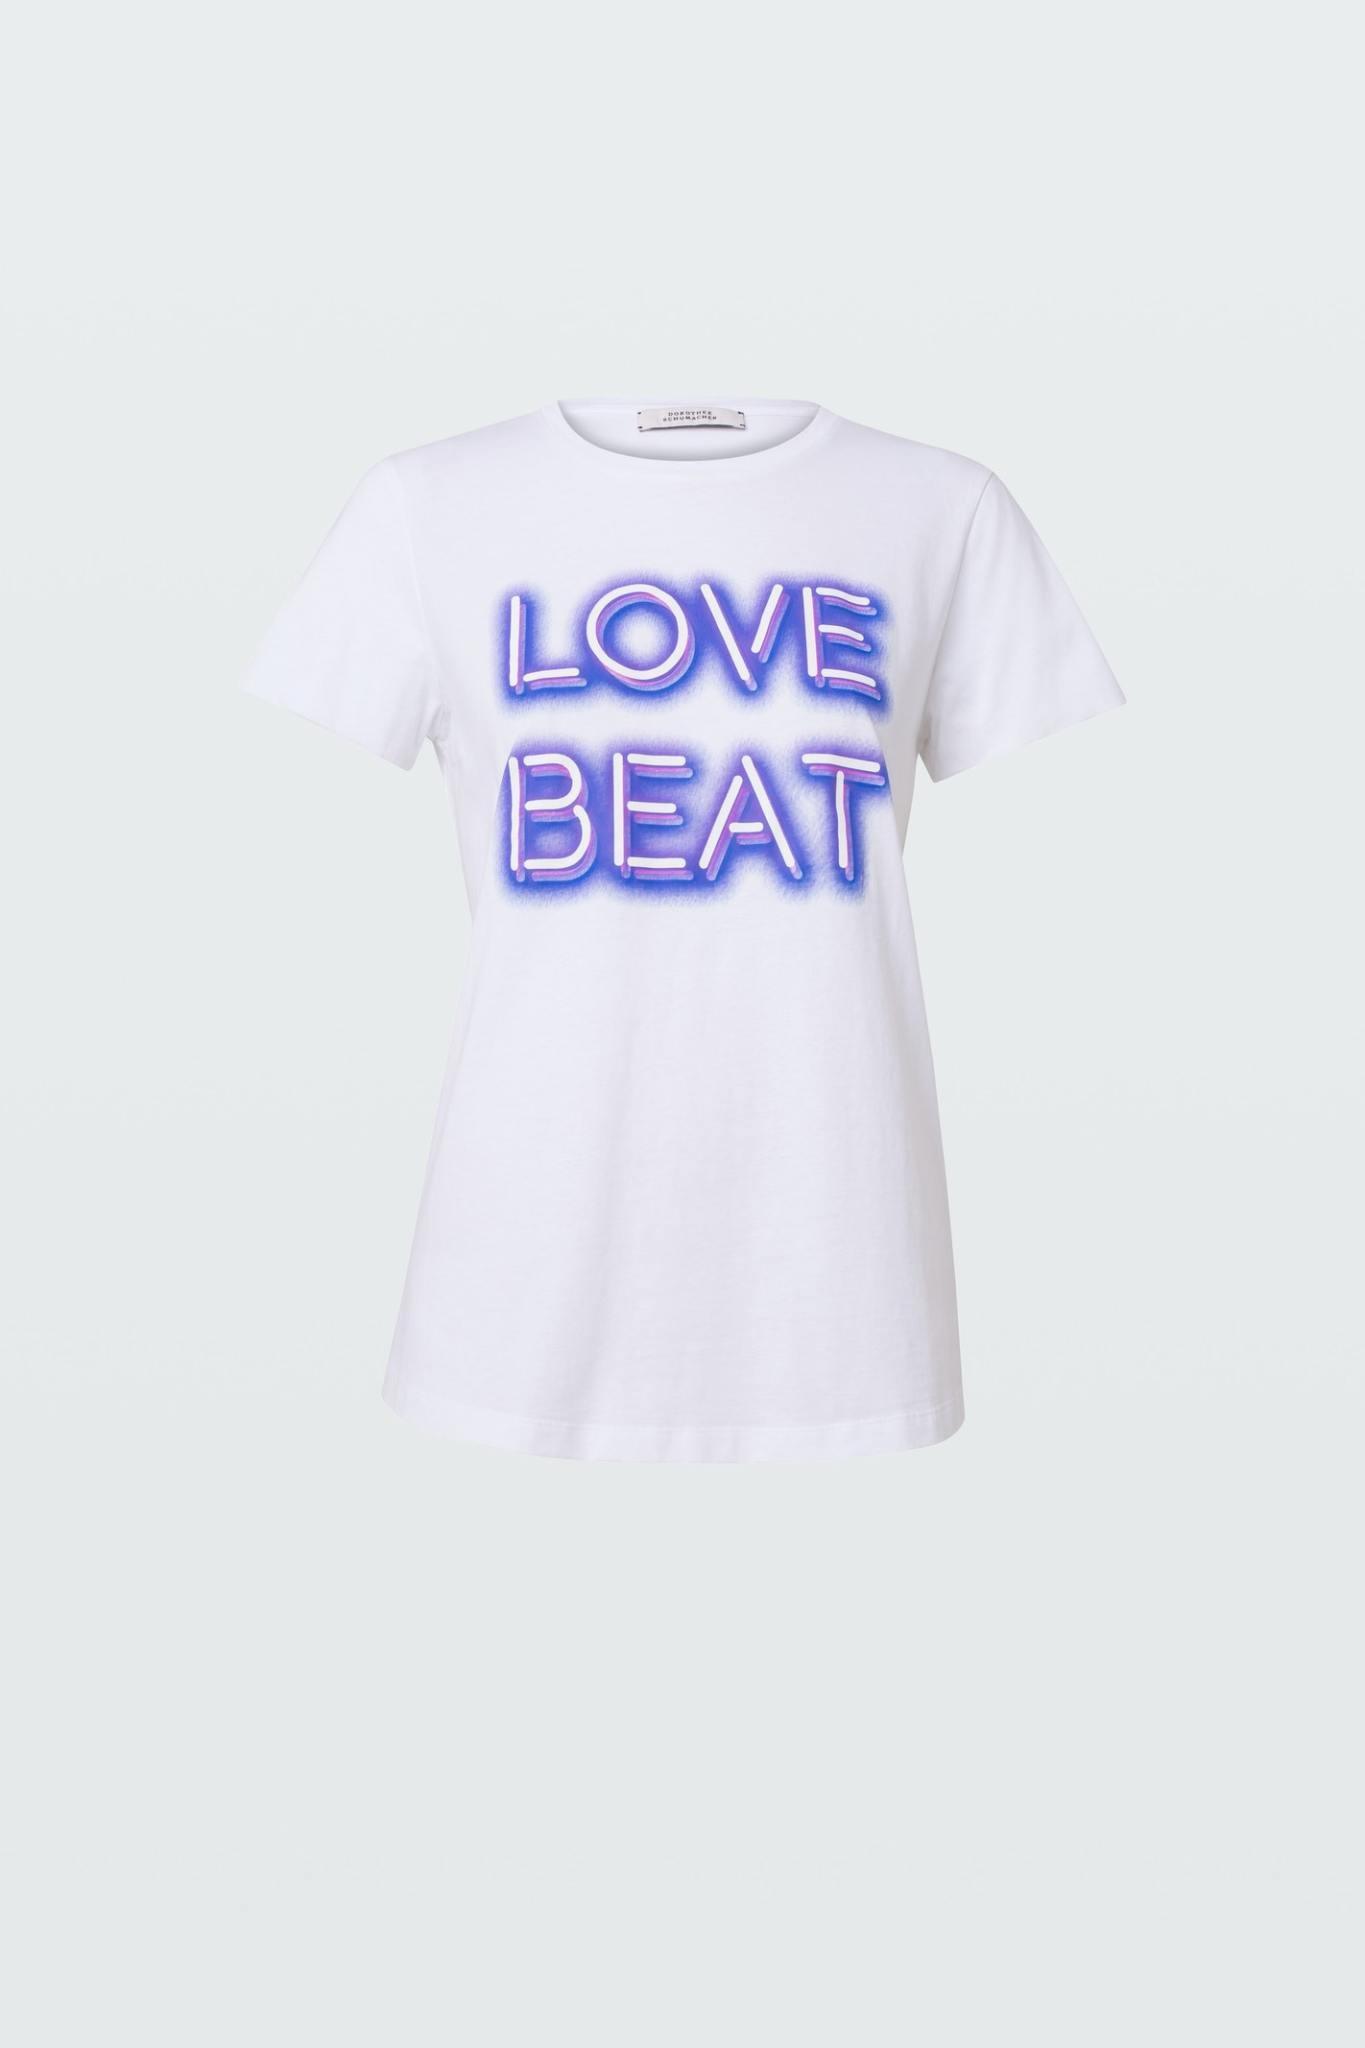 Neon love beat shirt dorothee schumacher-11